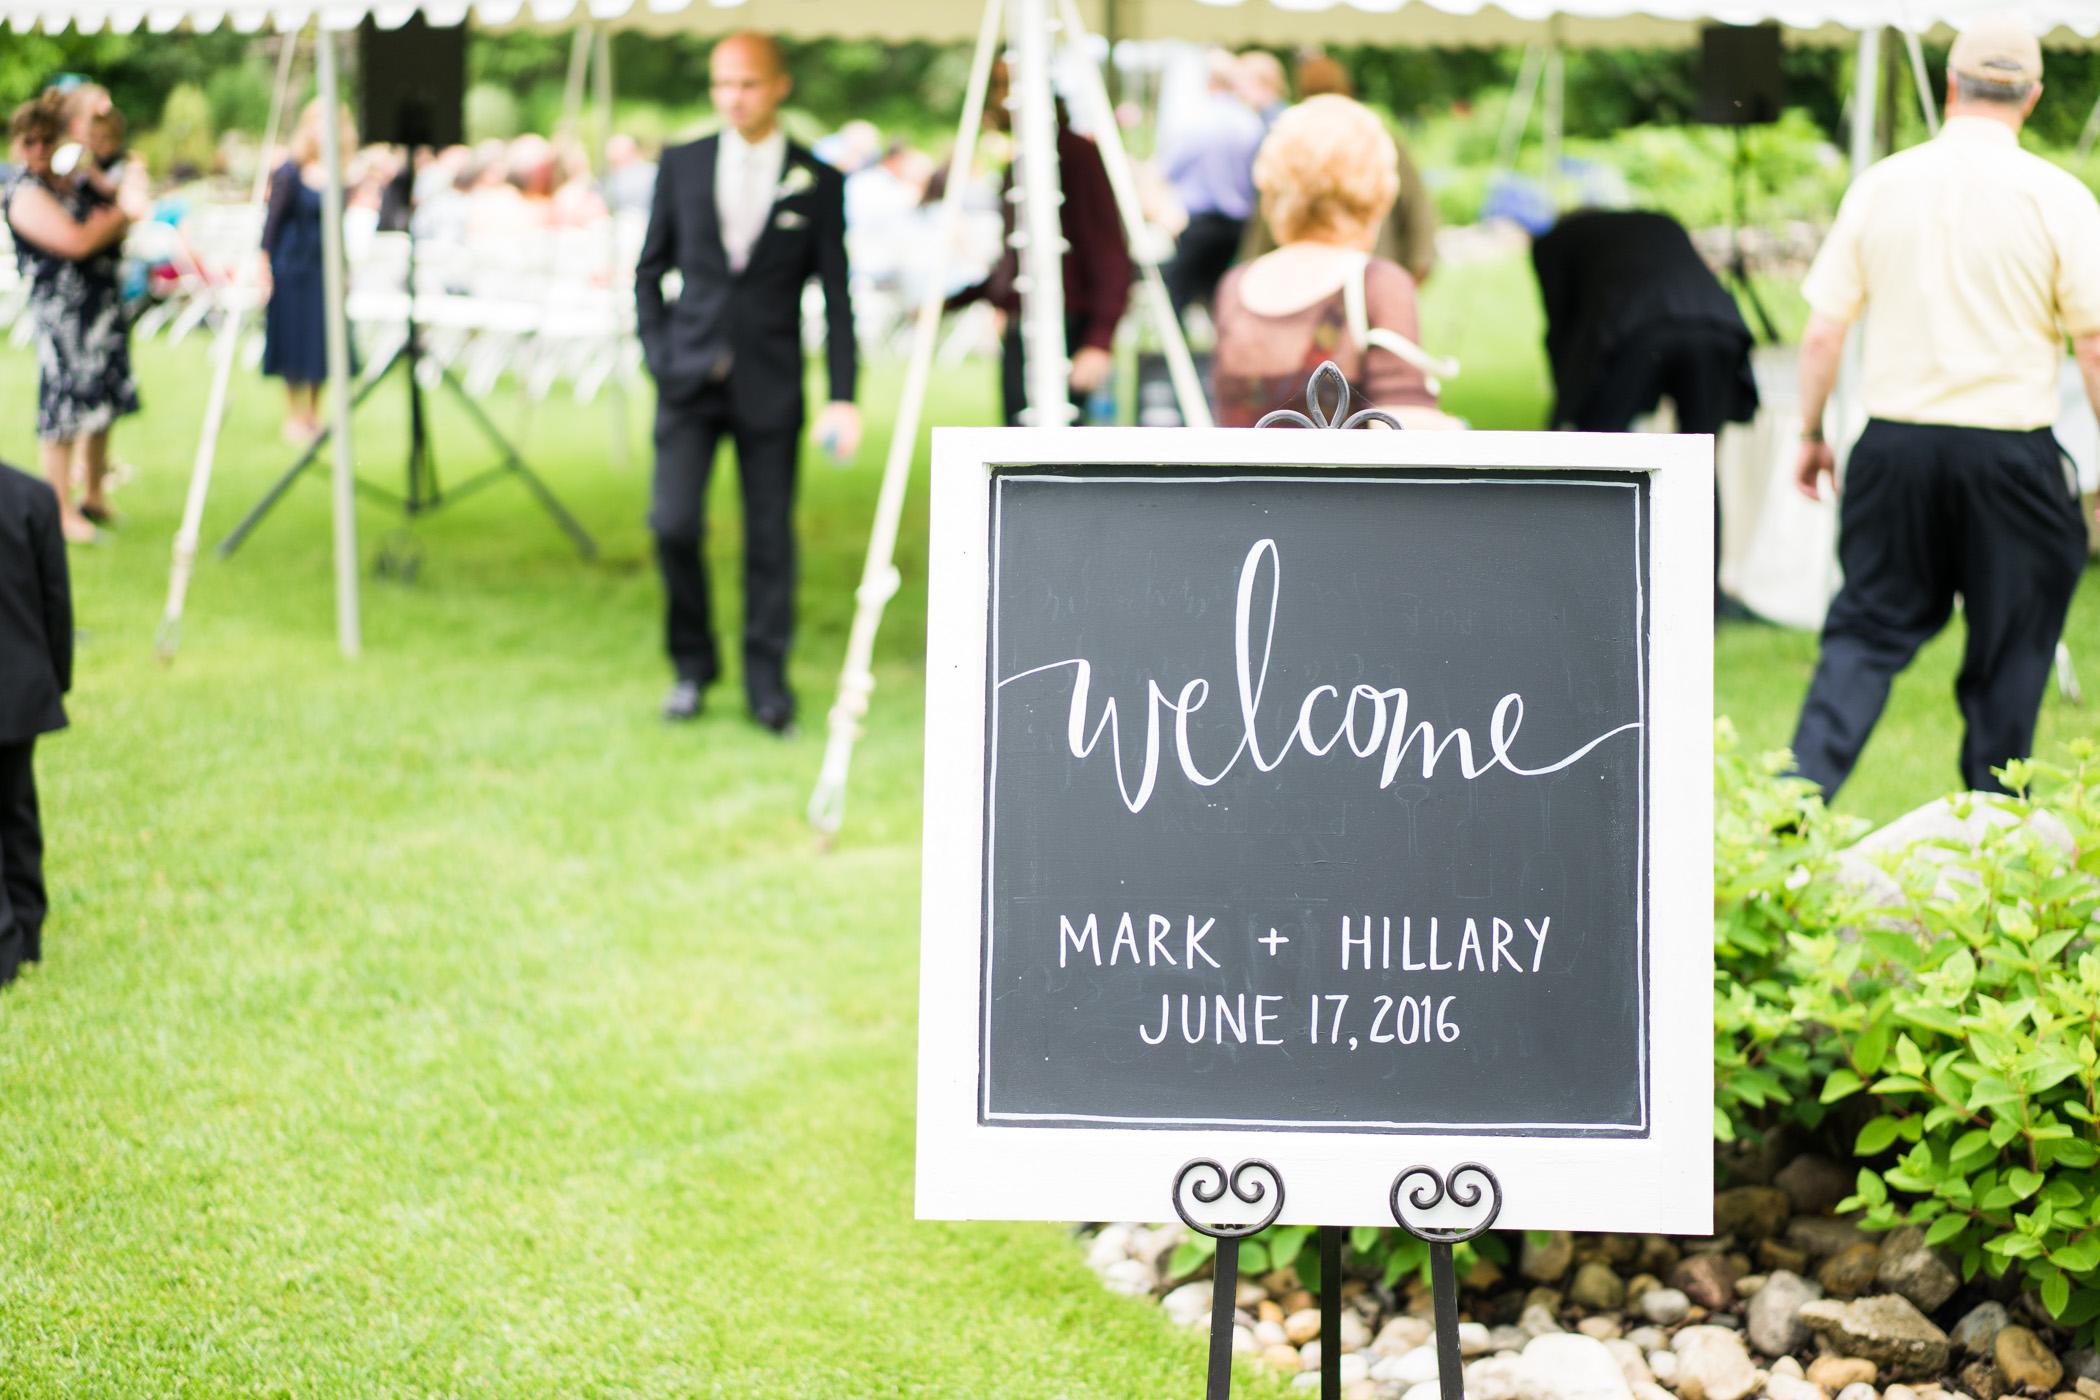 Hillary and Mark - Pineridge Hollow Wedding - Cojo Photo-480.jpg